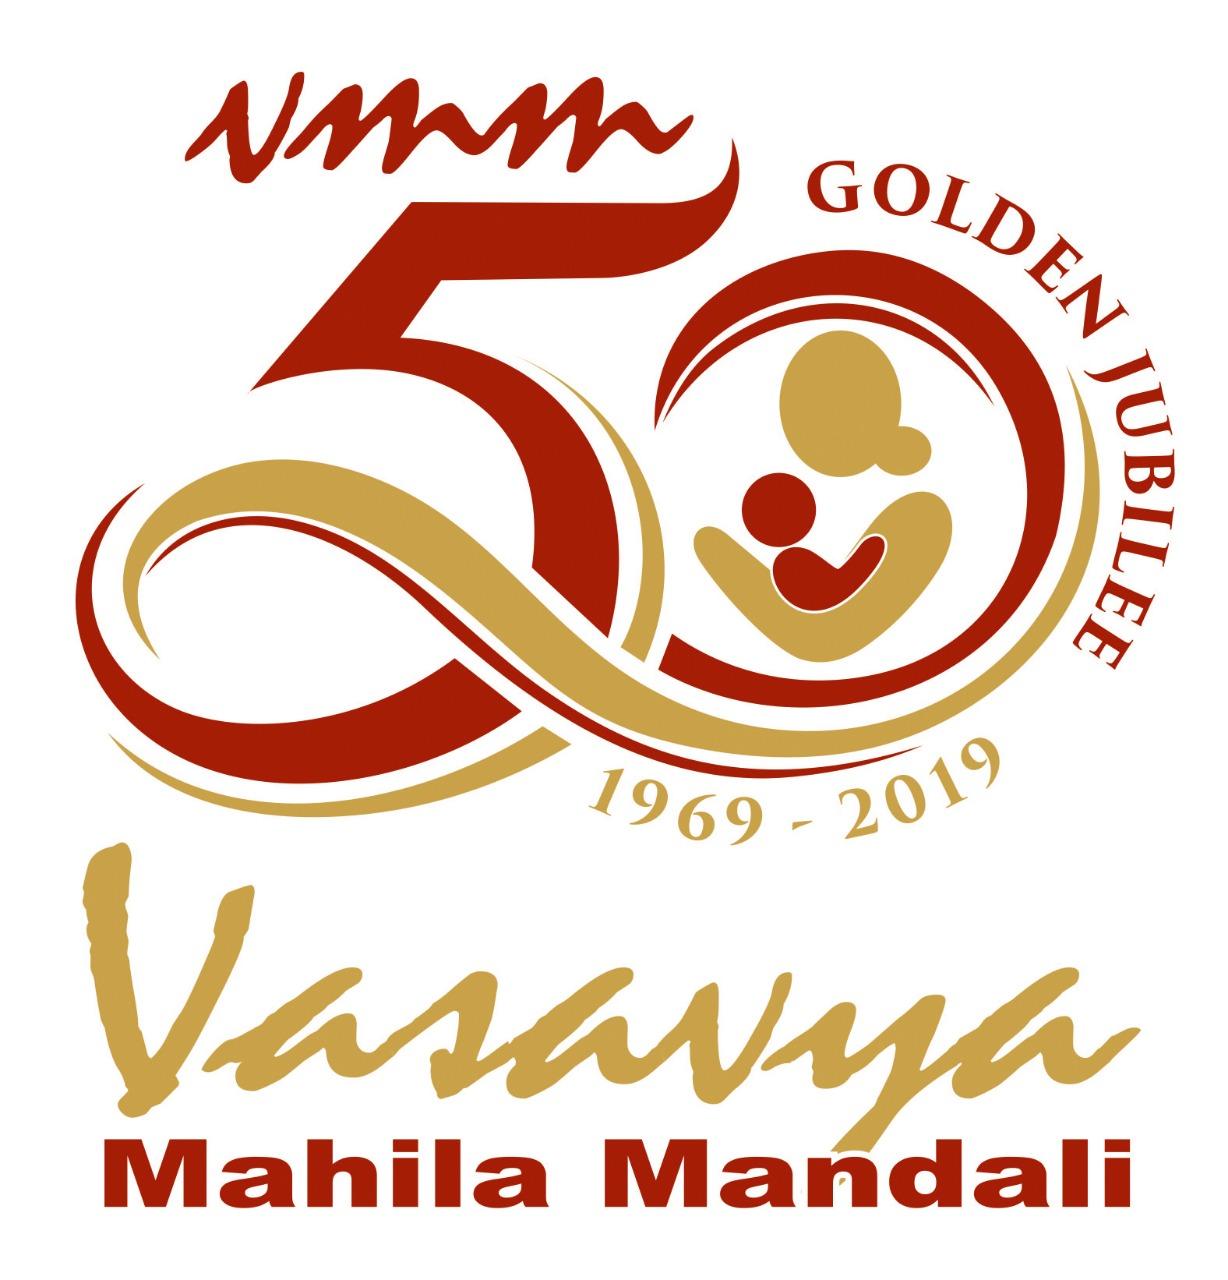 VMM 50 logo.jpeg